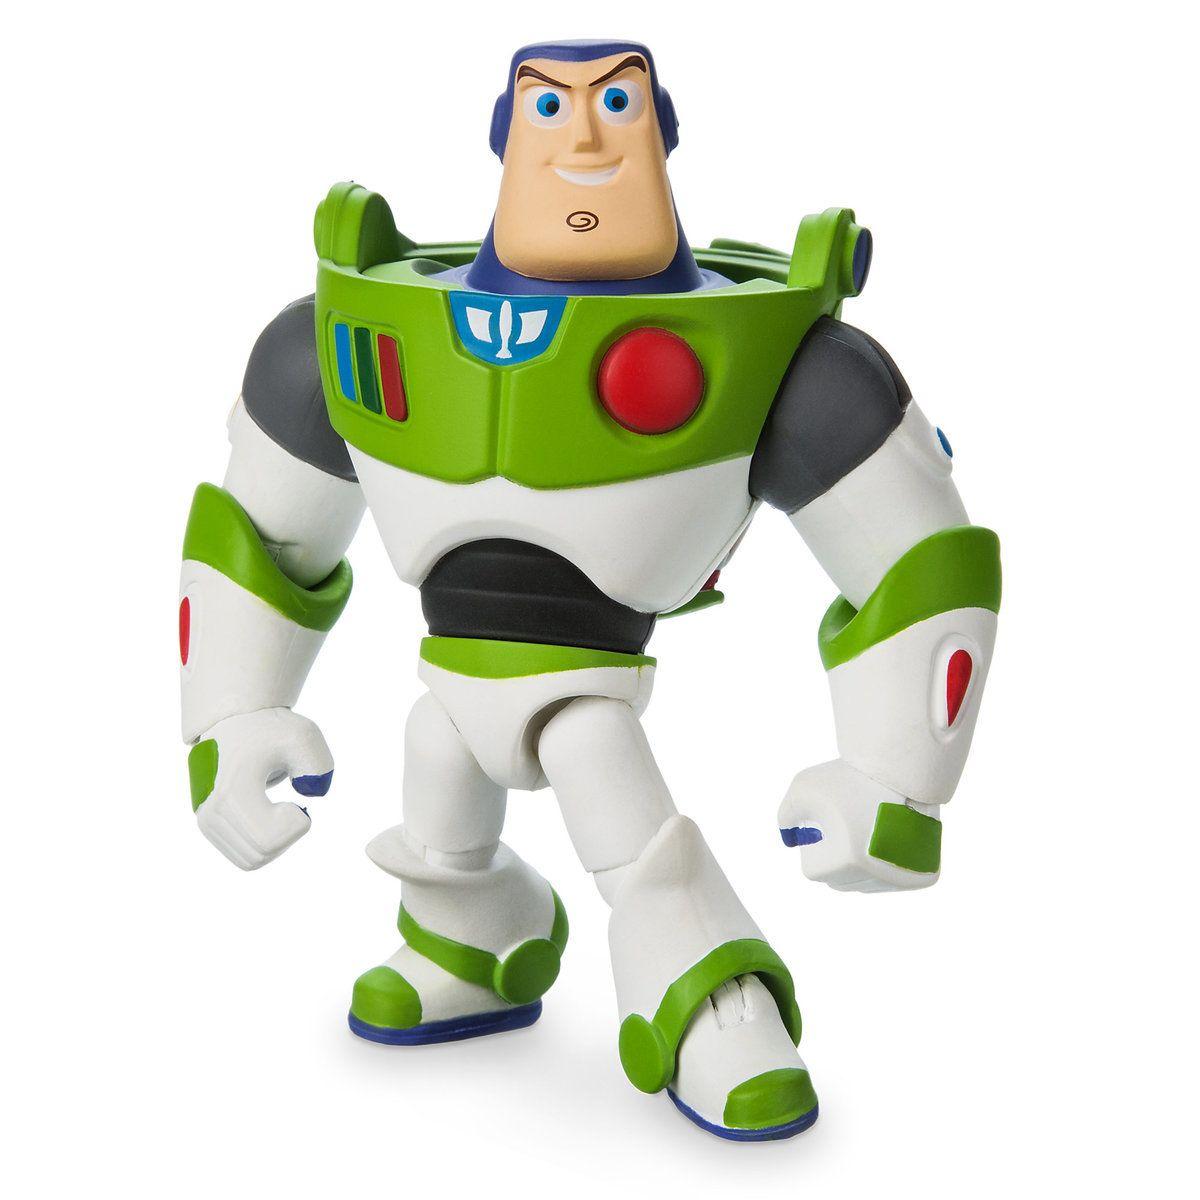 Toy Story 4 Buzz Lightyear PIXAR Toybox Exclusivo Disney Store